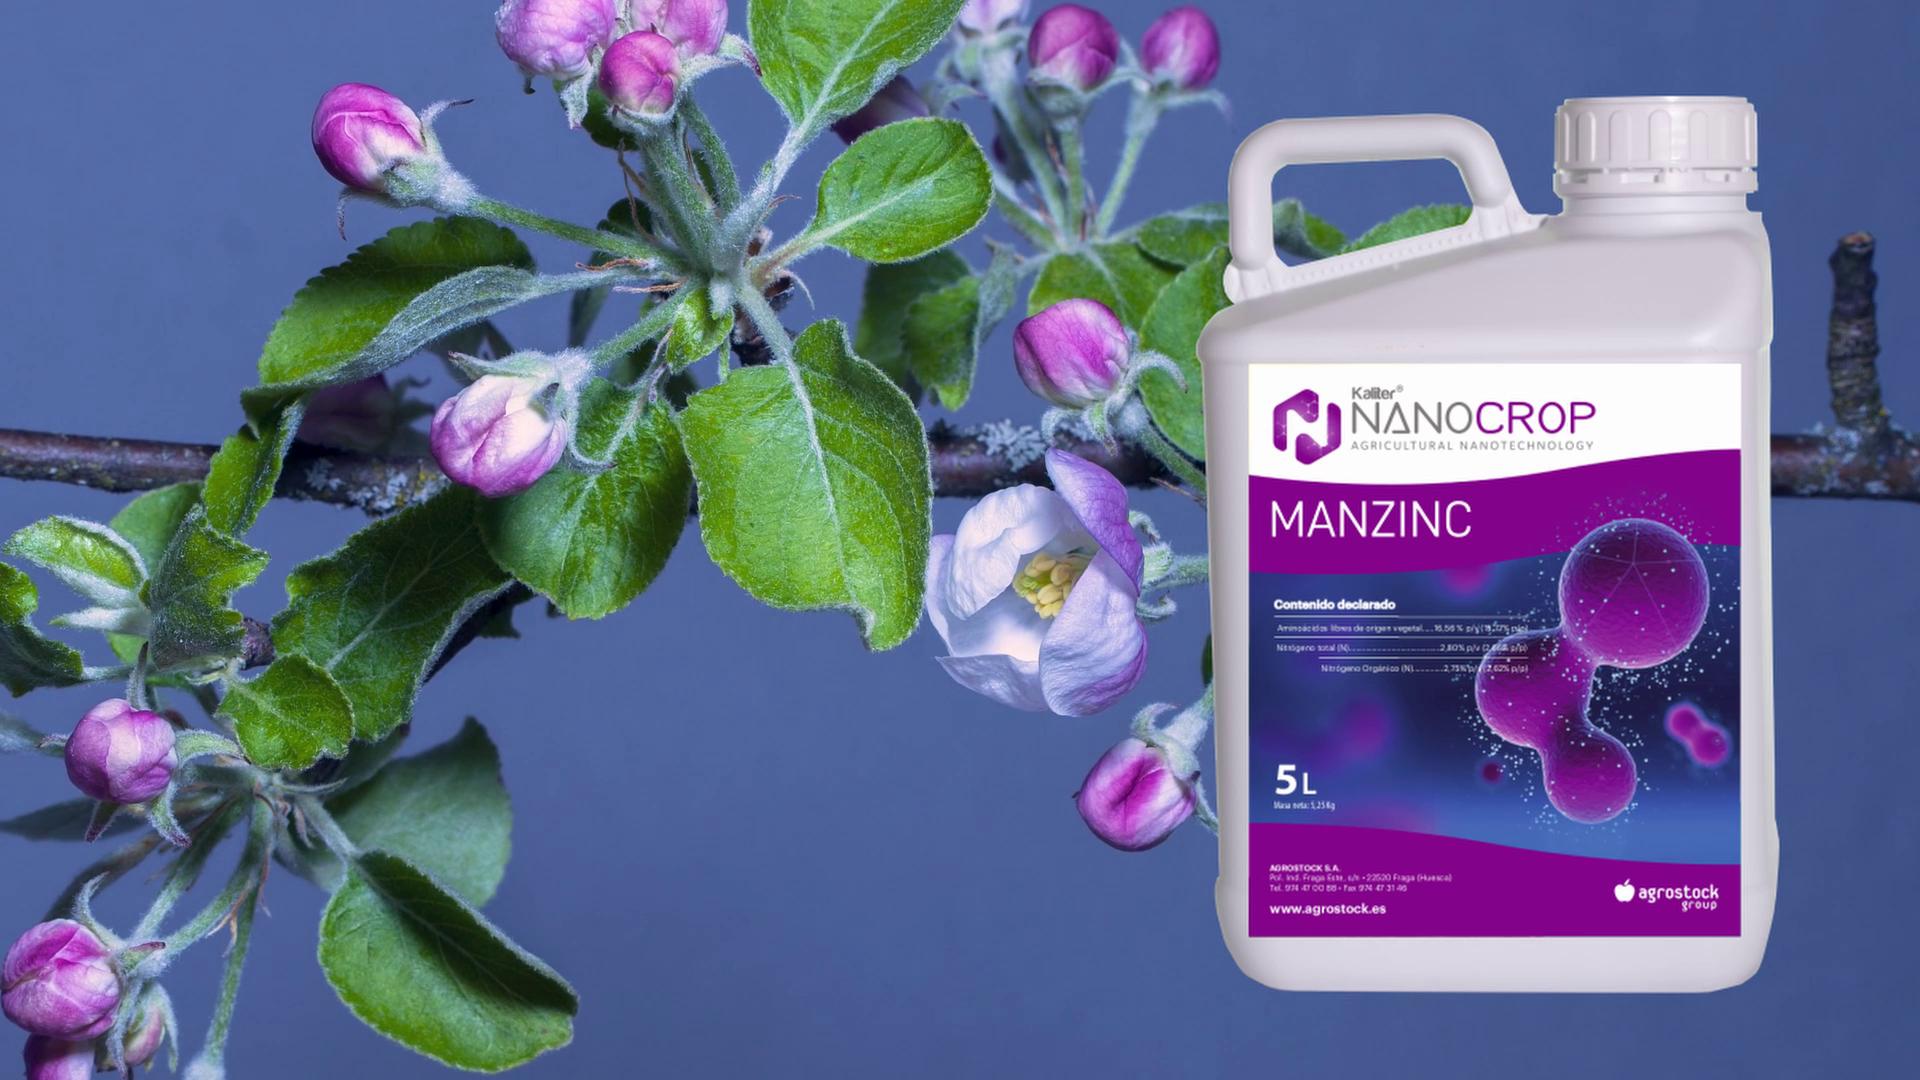 Nanocrop Manzinc